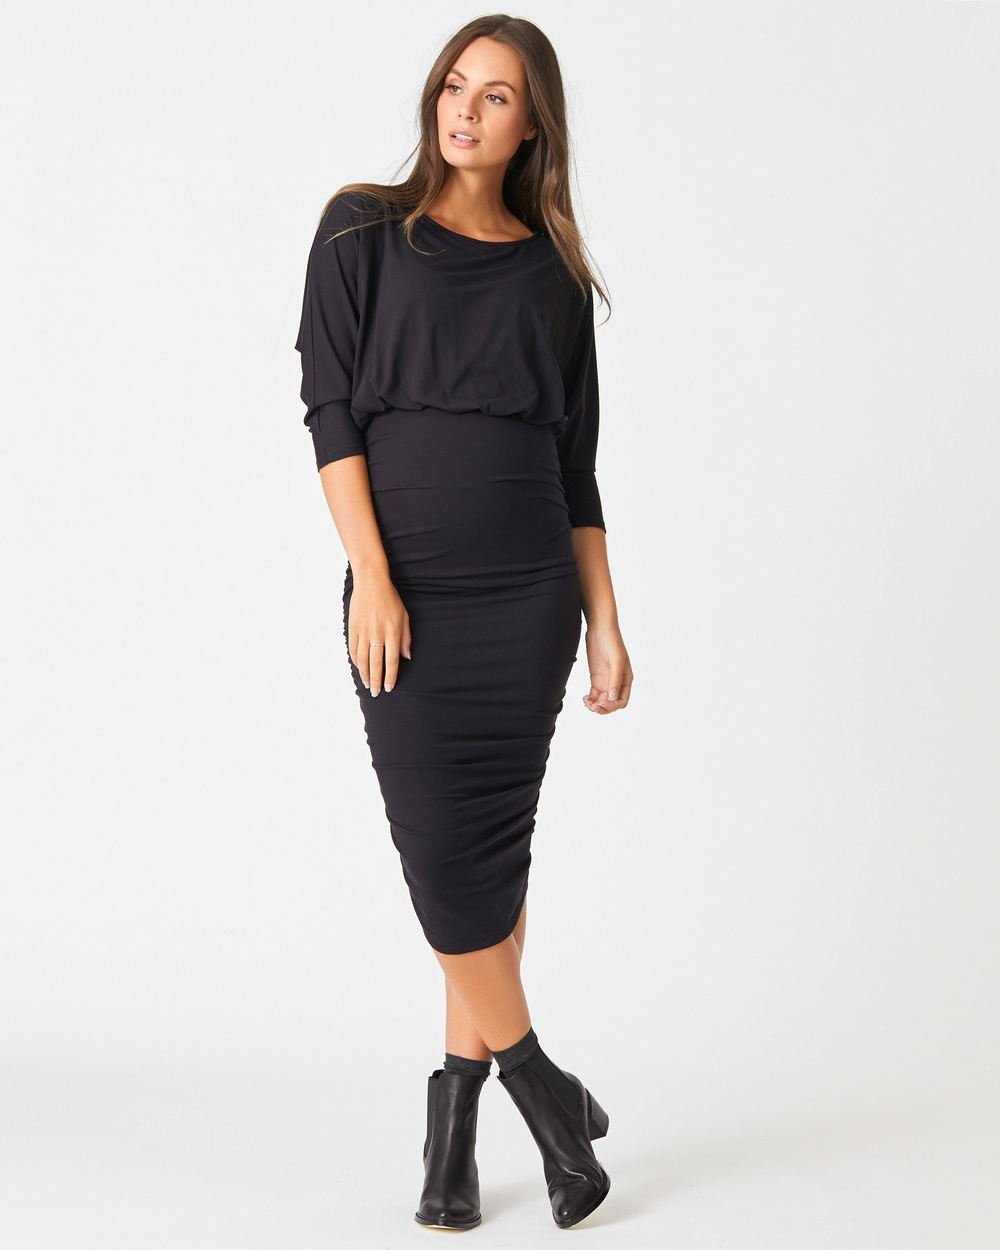 Pea in a Pod Maternity Aspen Nursing Dress Dresses Black Aspen Nursing Dress